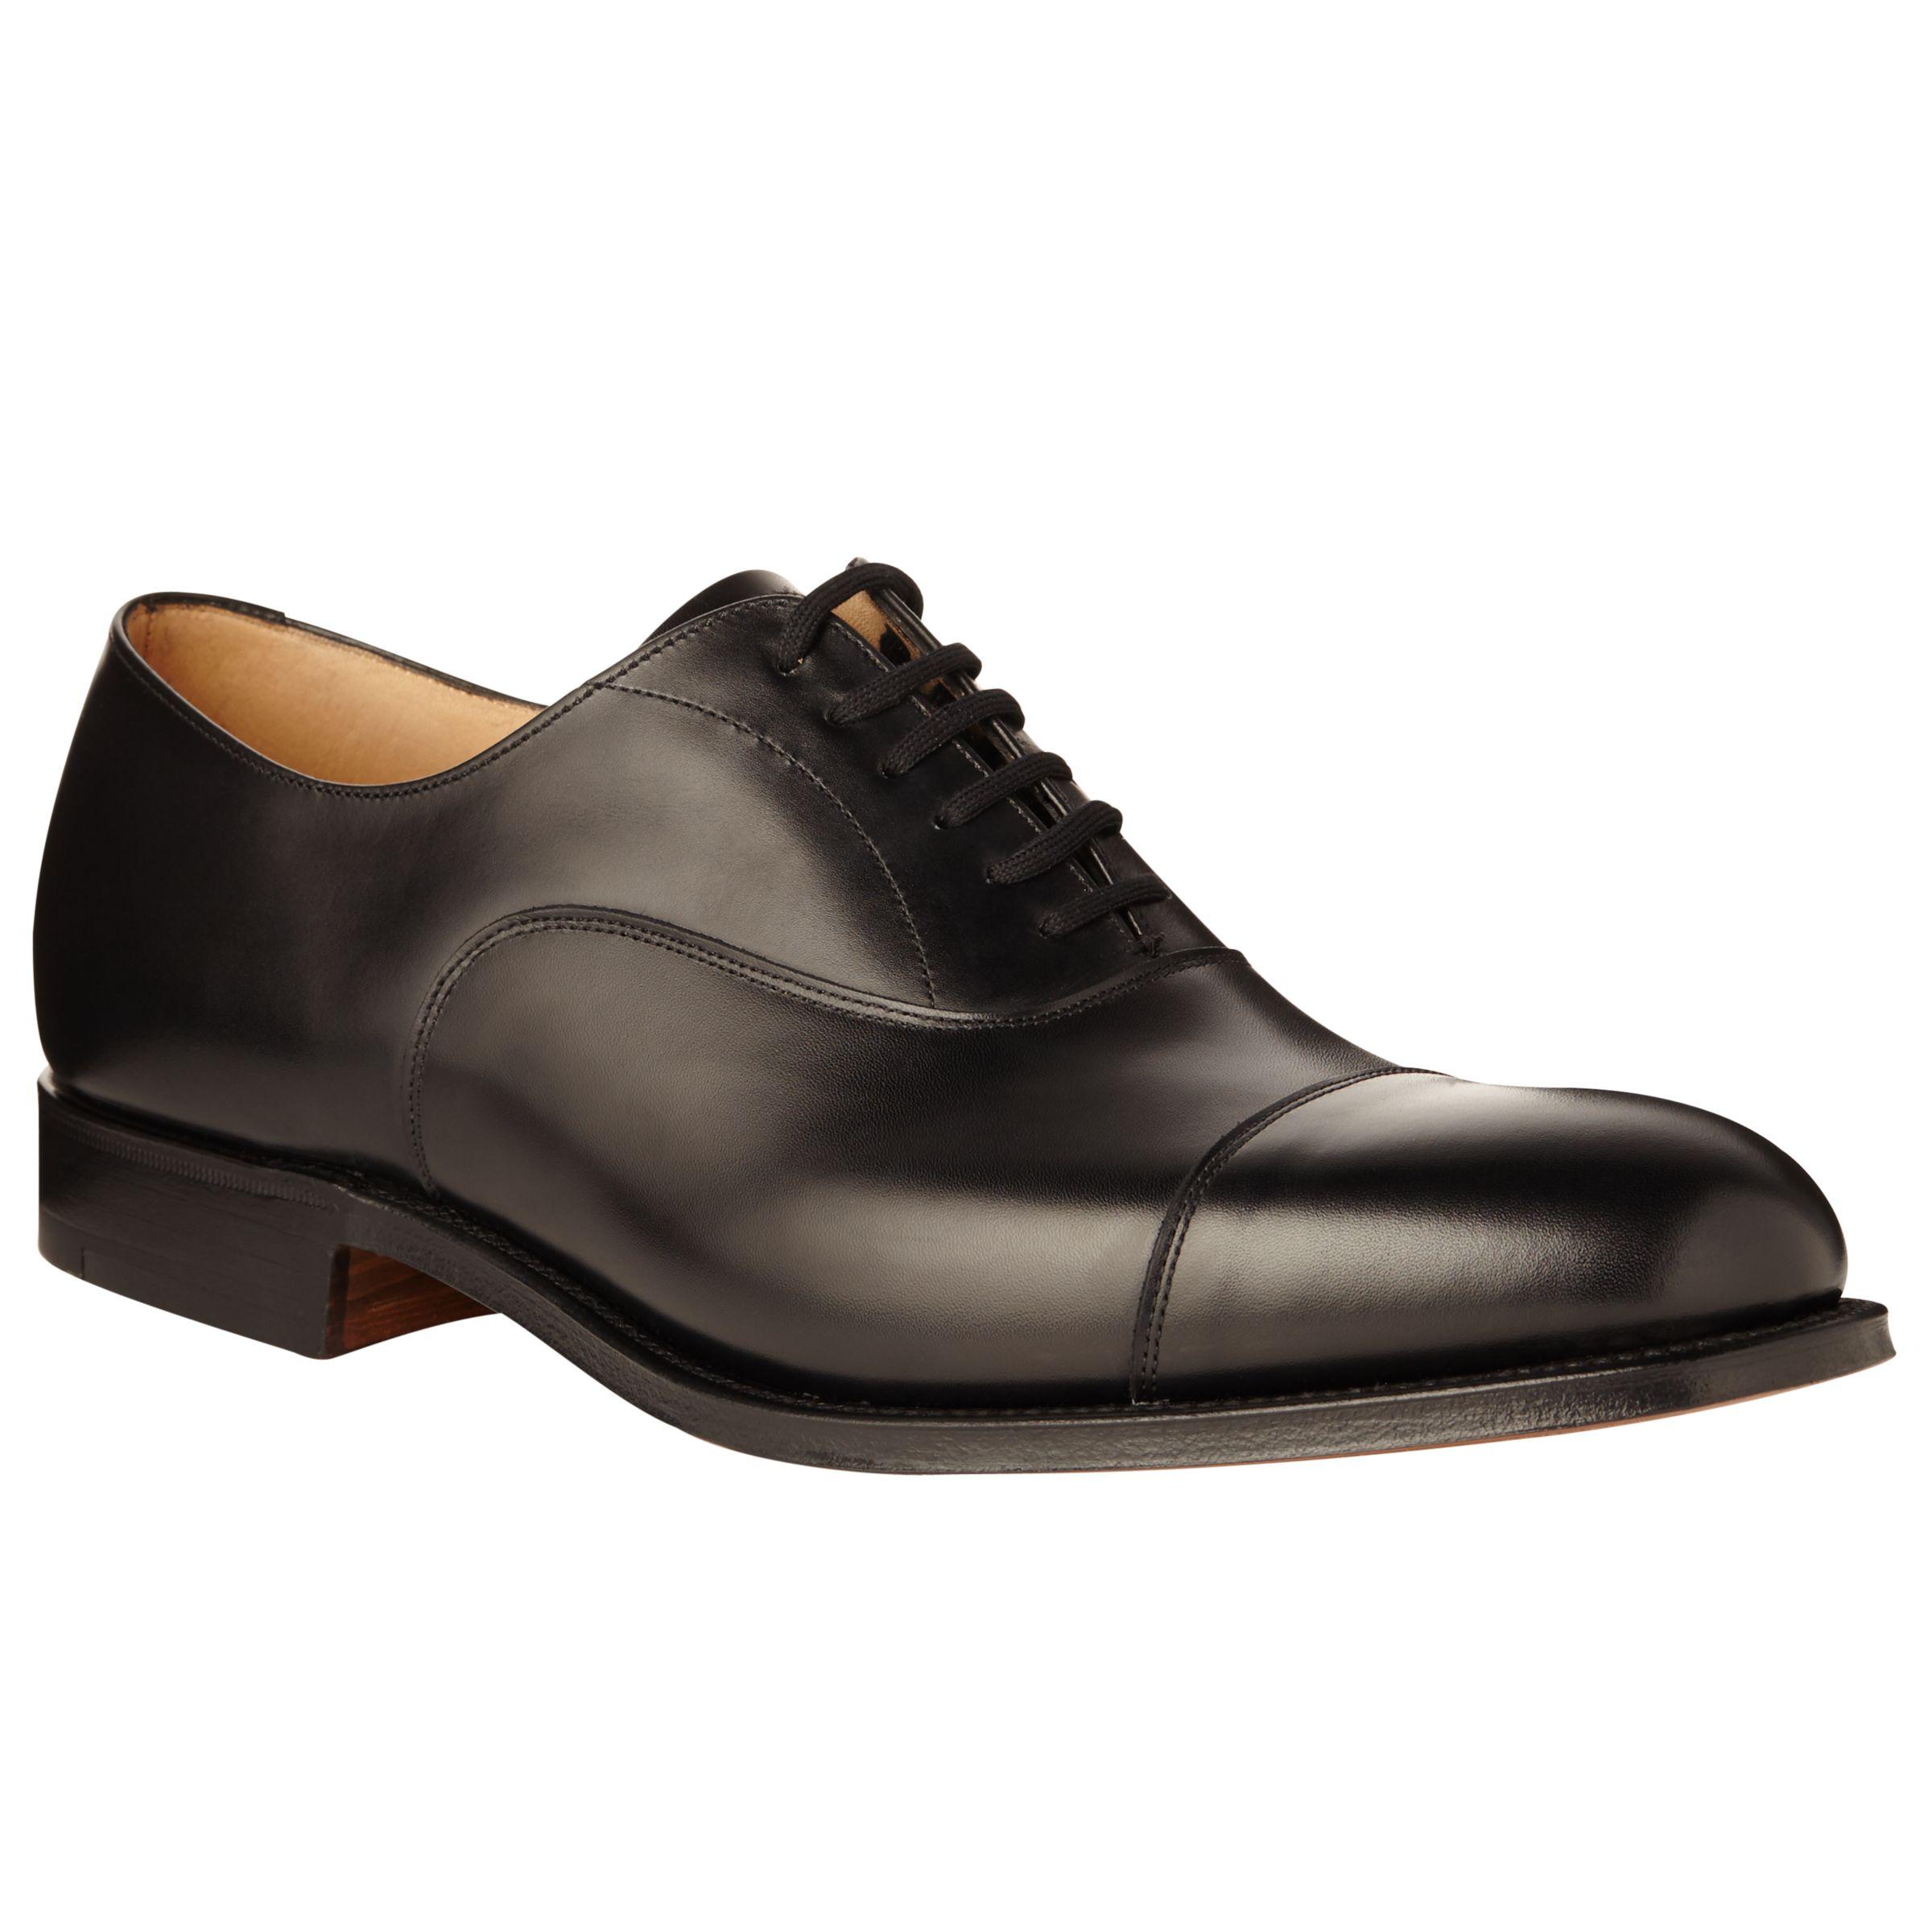 5306f75d3df6 Church s Dubai Leather Oxford Shoes